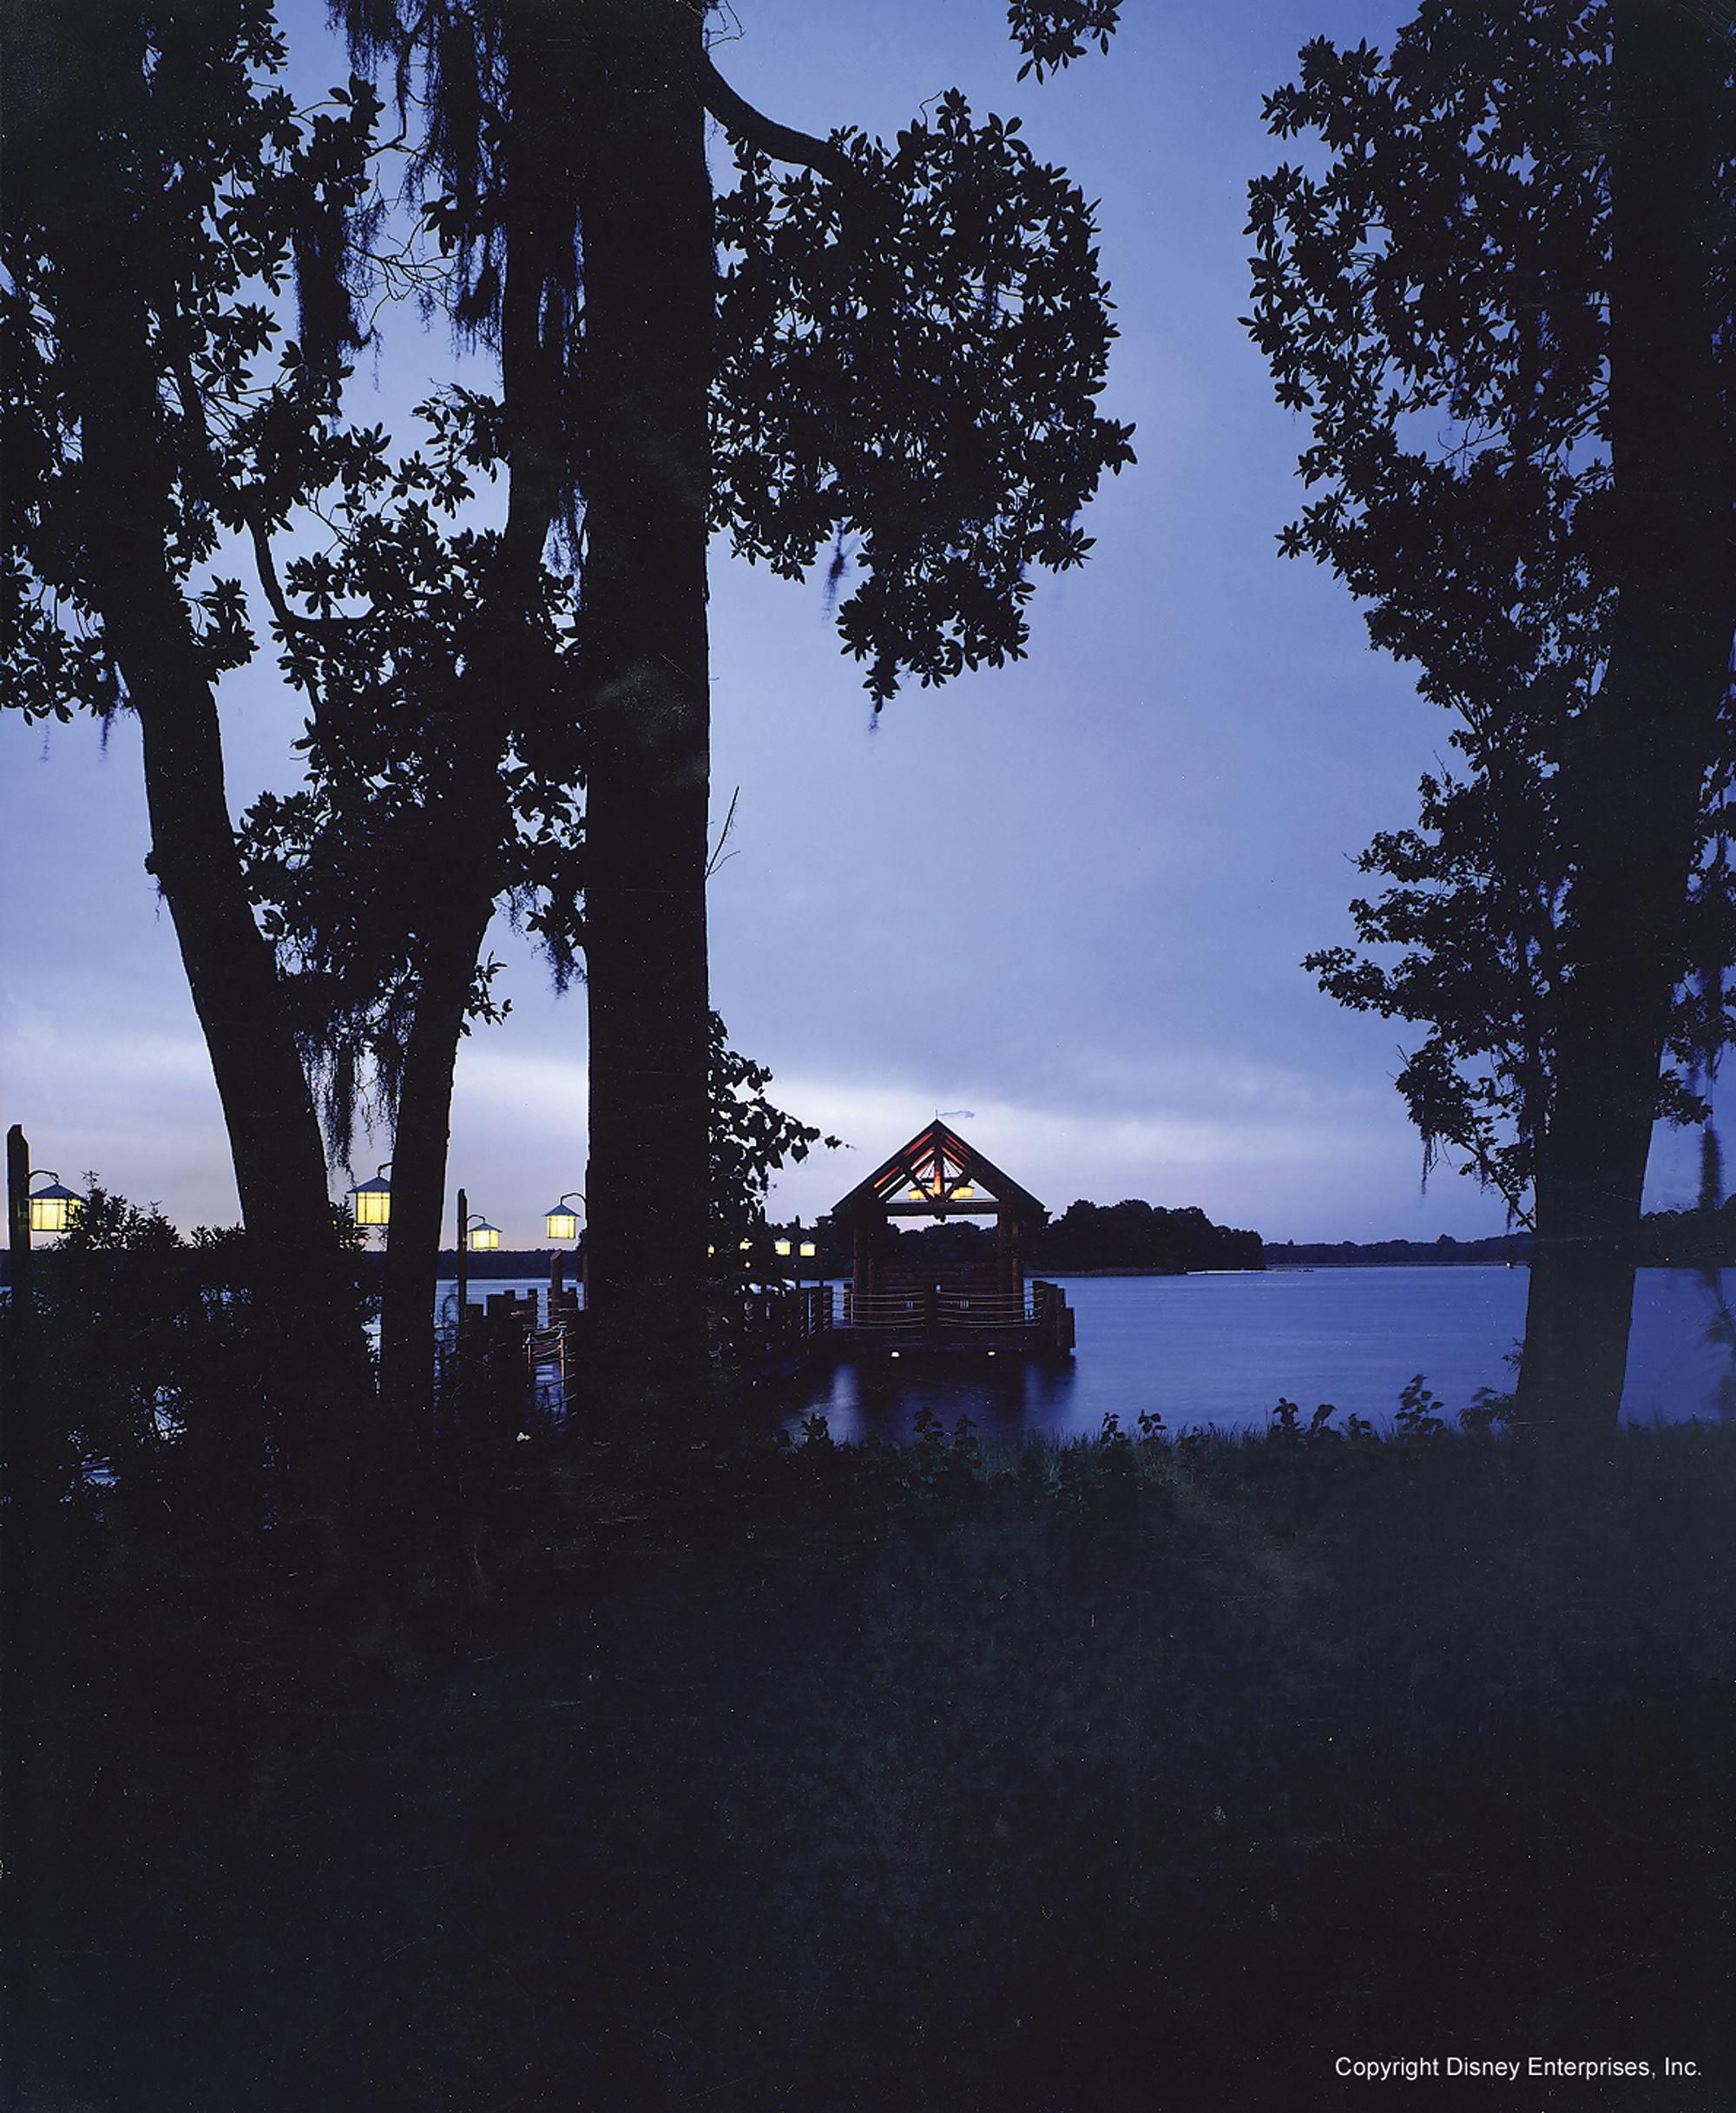 disney_wilderness_lodge_anaheim_florida_dock.jpg